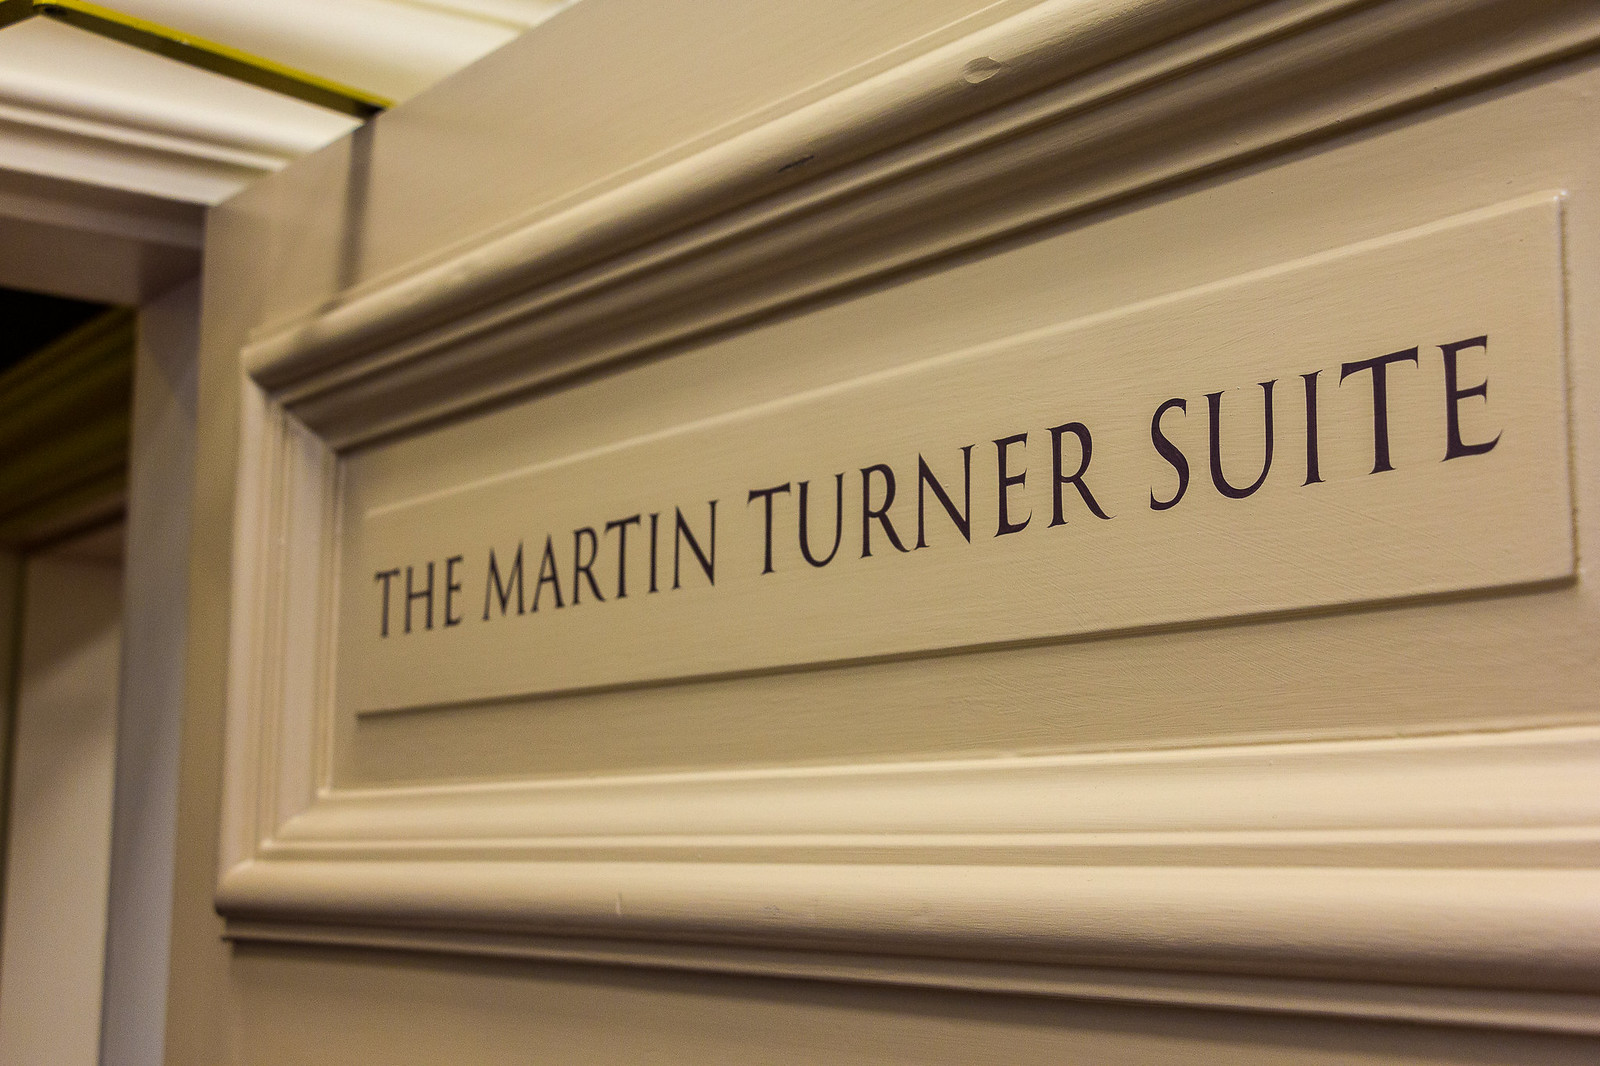 Dedication of the Martin Turner Suite